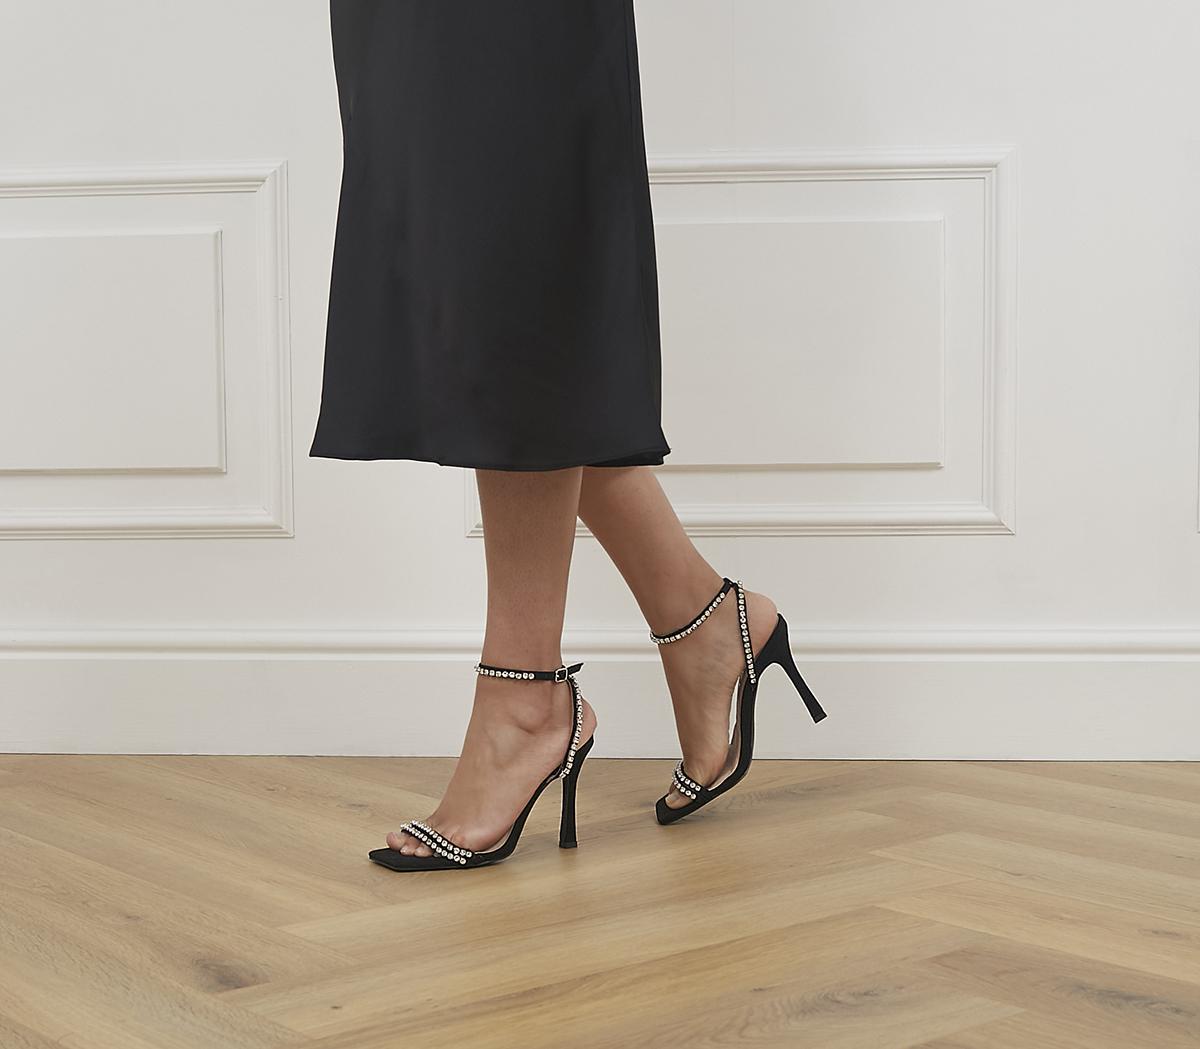 Herself Embellished Stiletto Heels